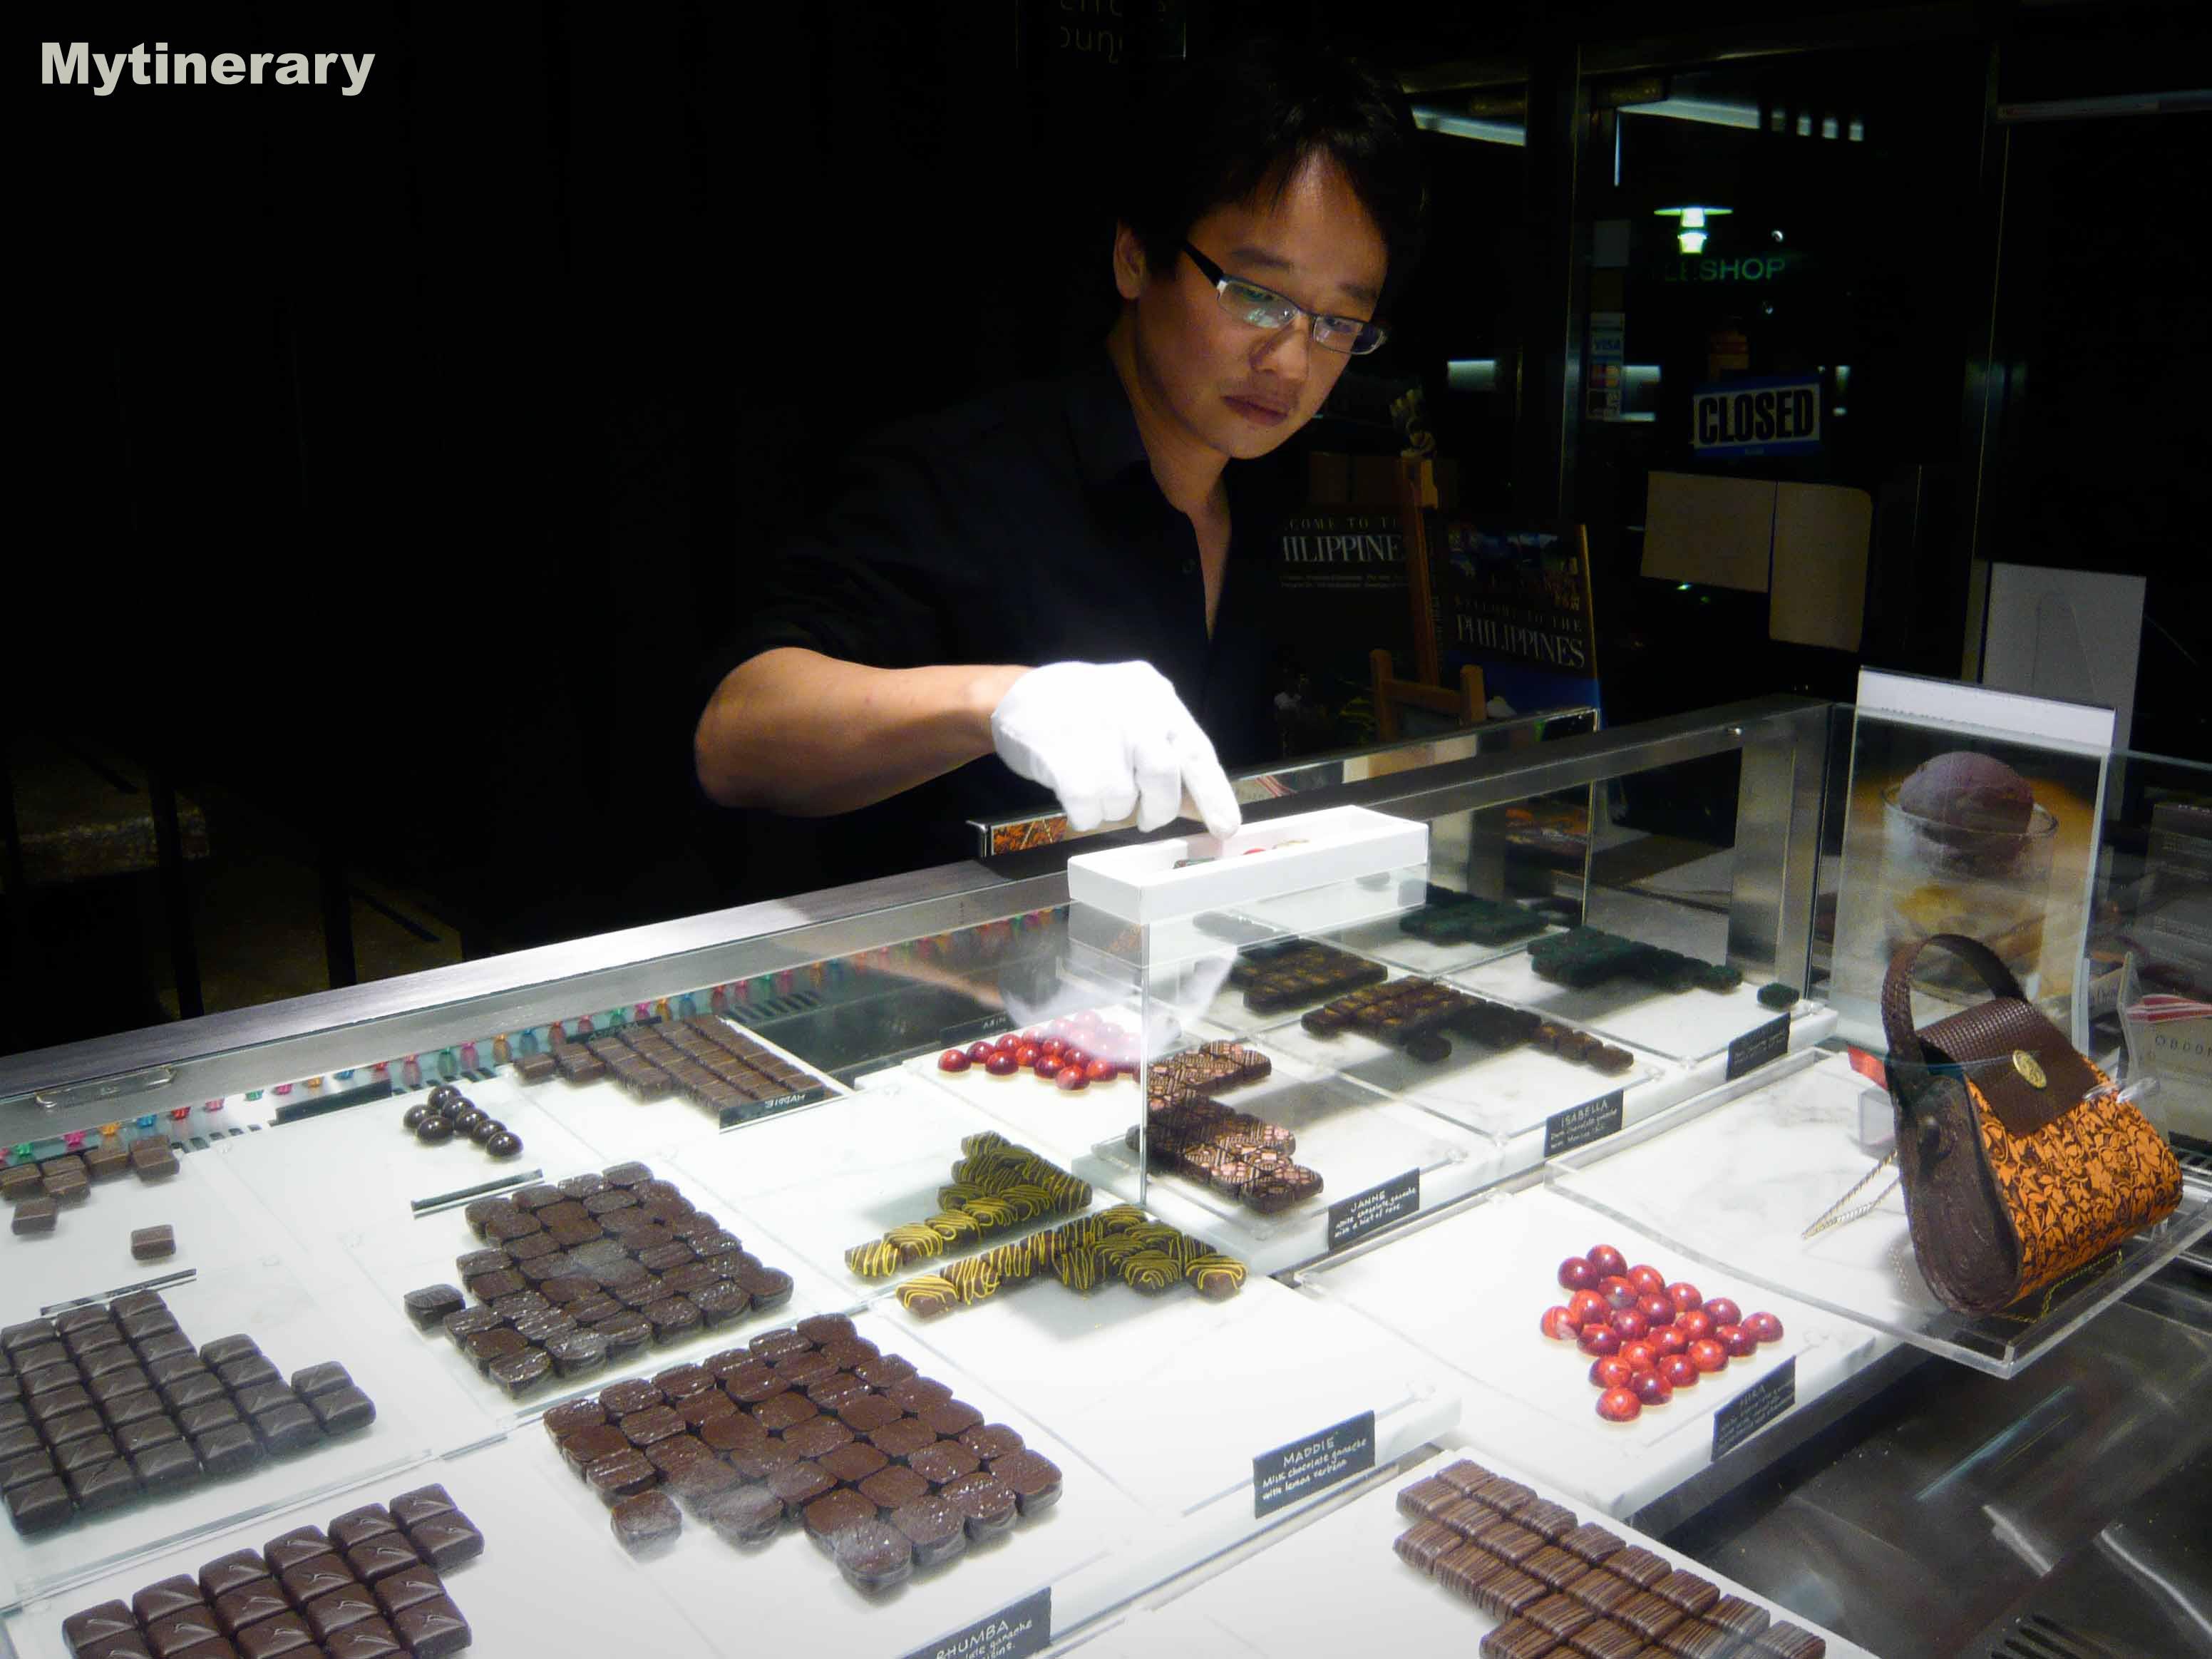 Www.detours.typepad.com - Boon Chocolates 1